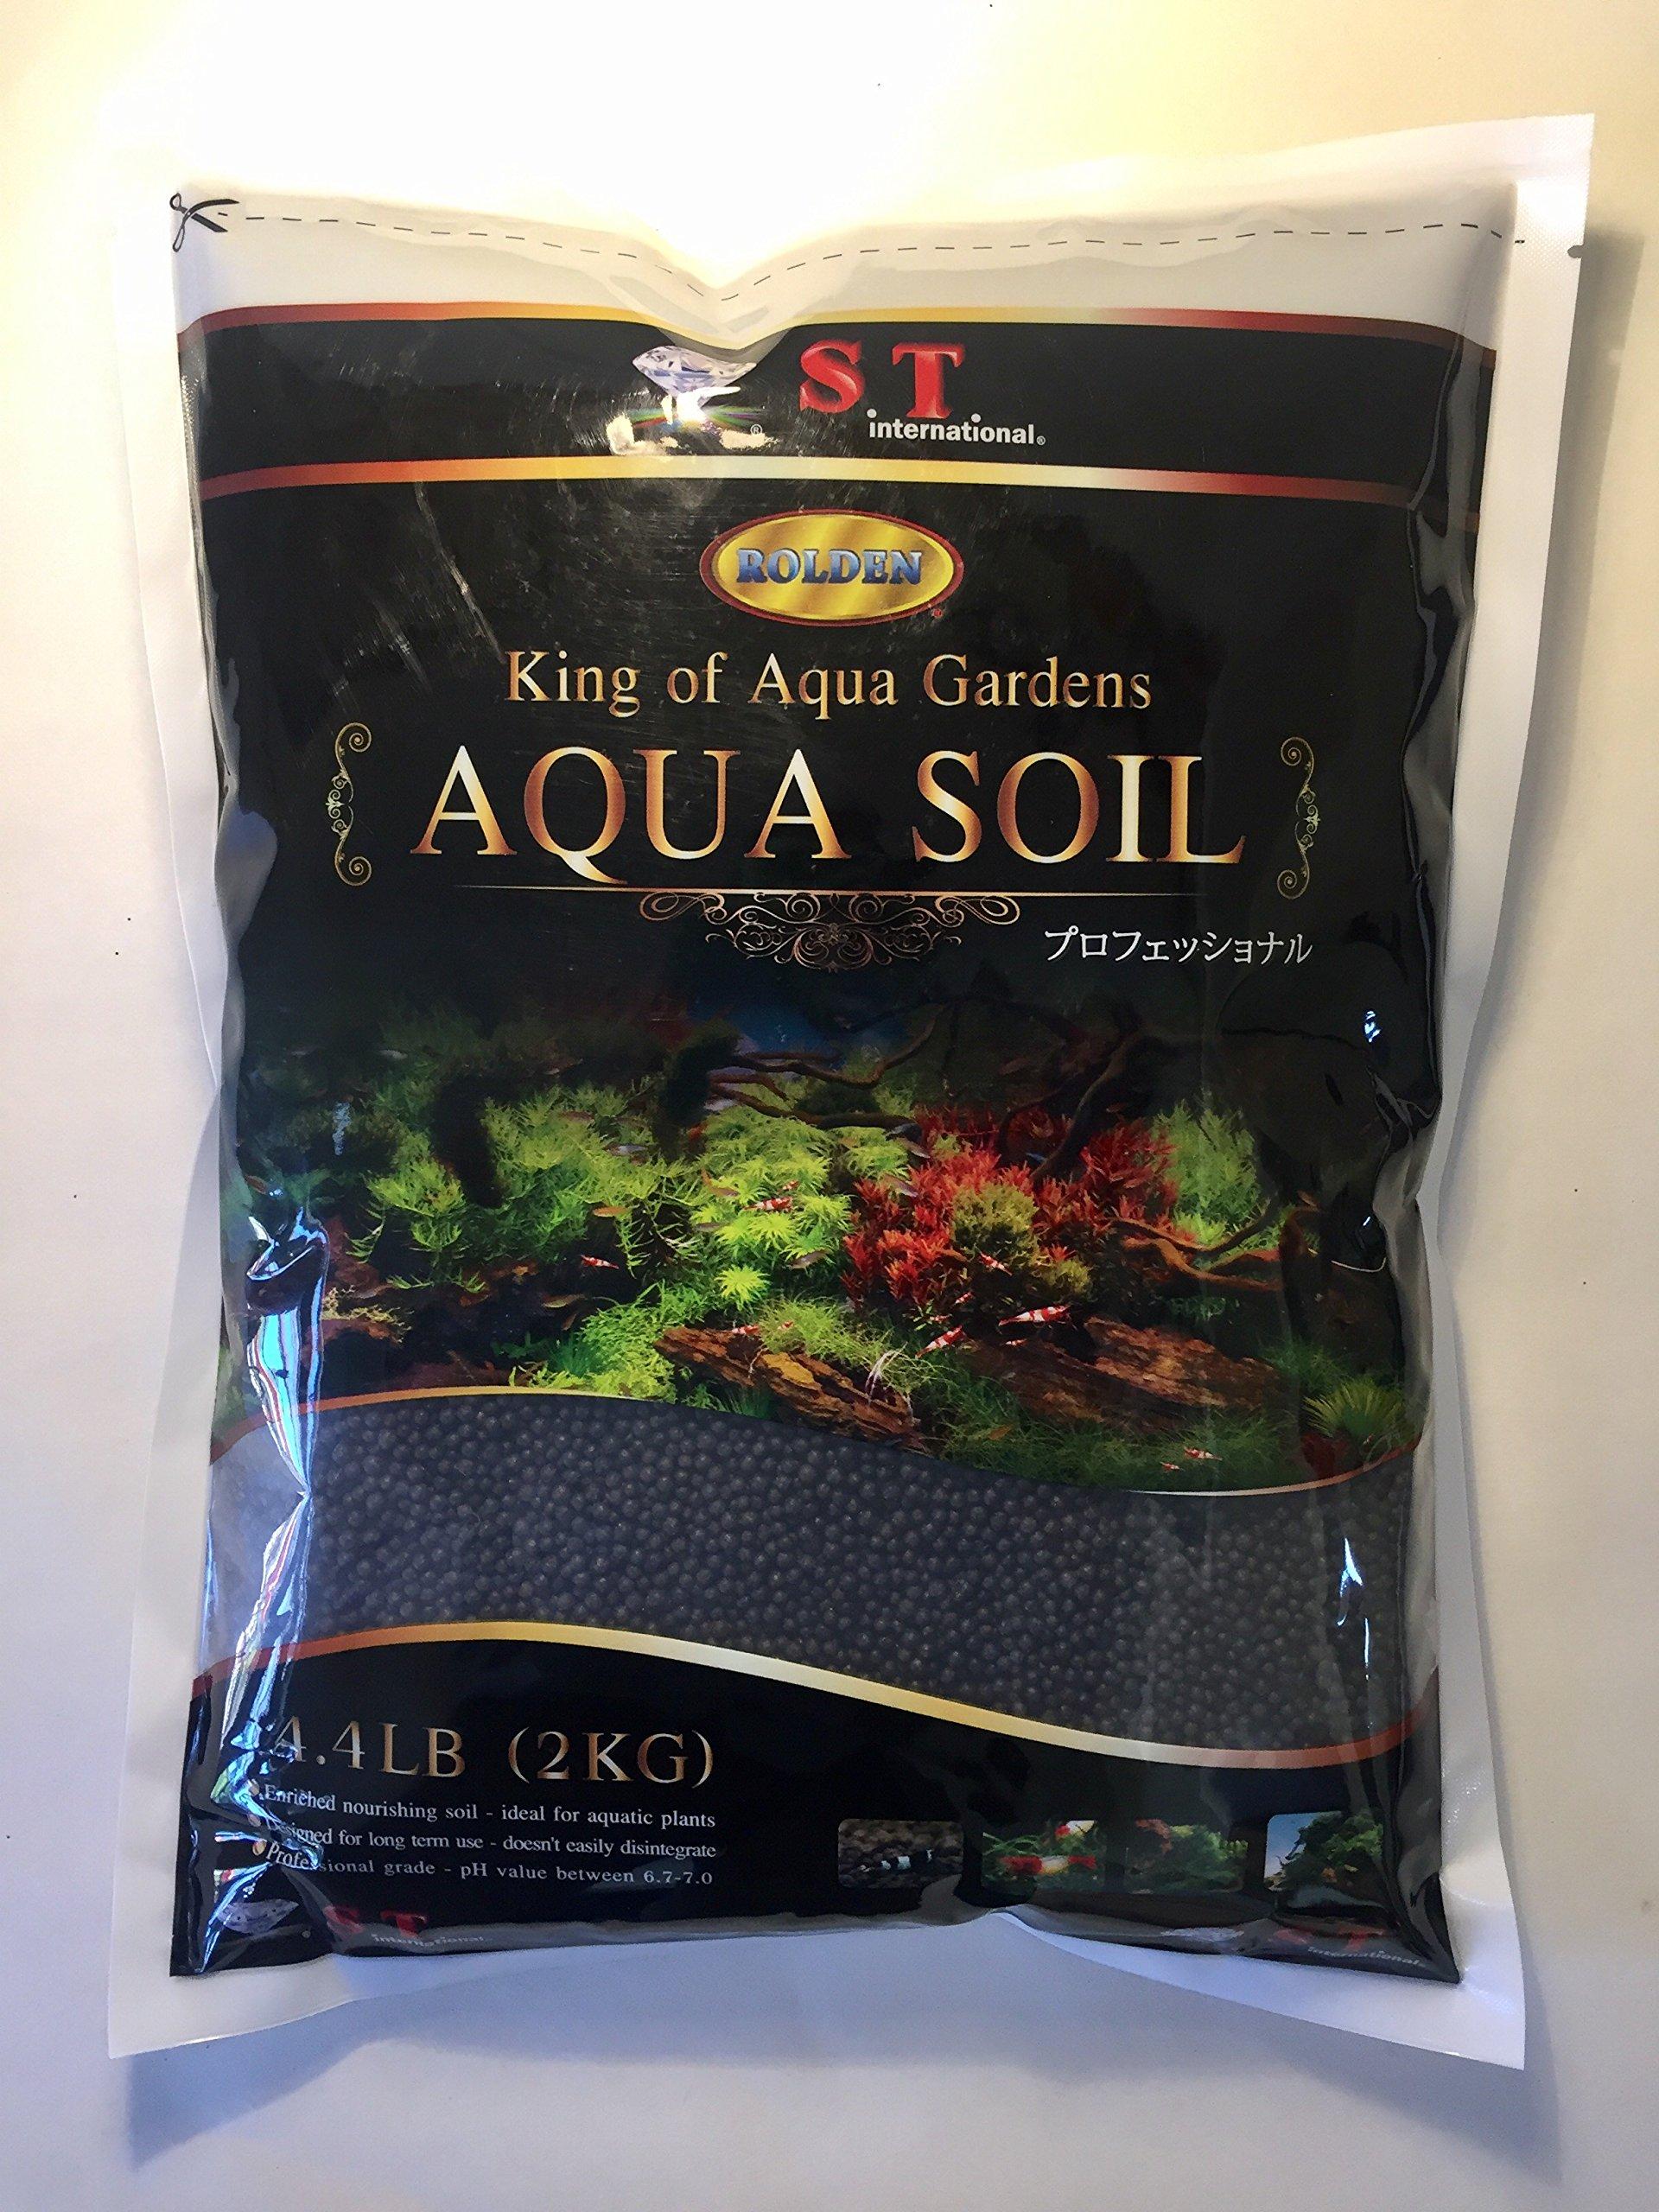 S.T. International Aqua Soil for Aquarium Plants, 4lb, Black by S.T. International